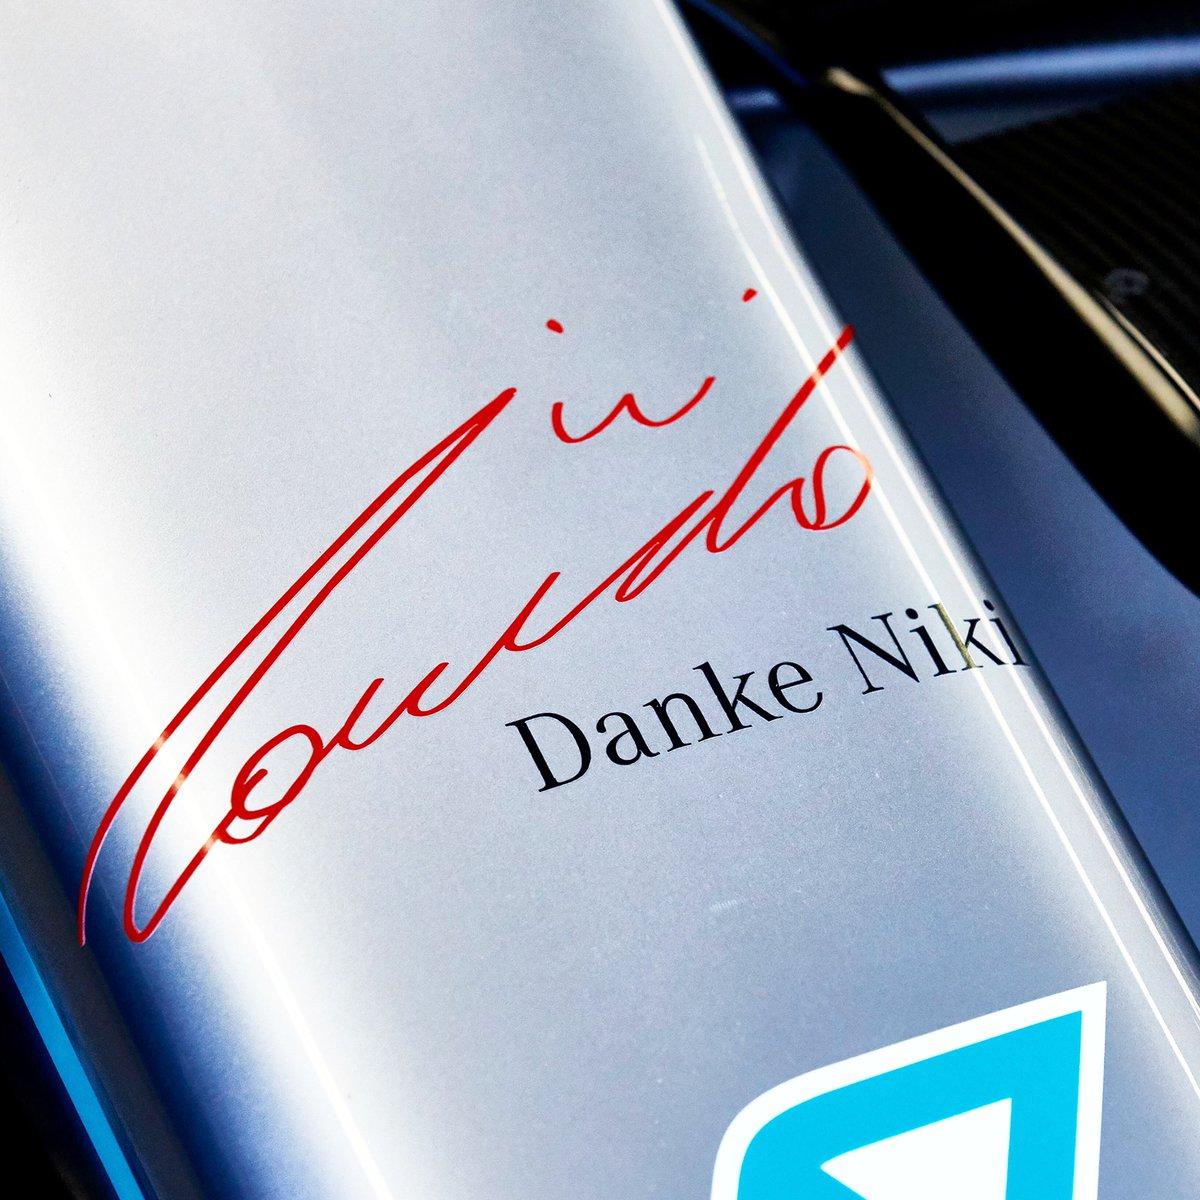 Danke Niki. 🙏